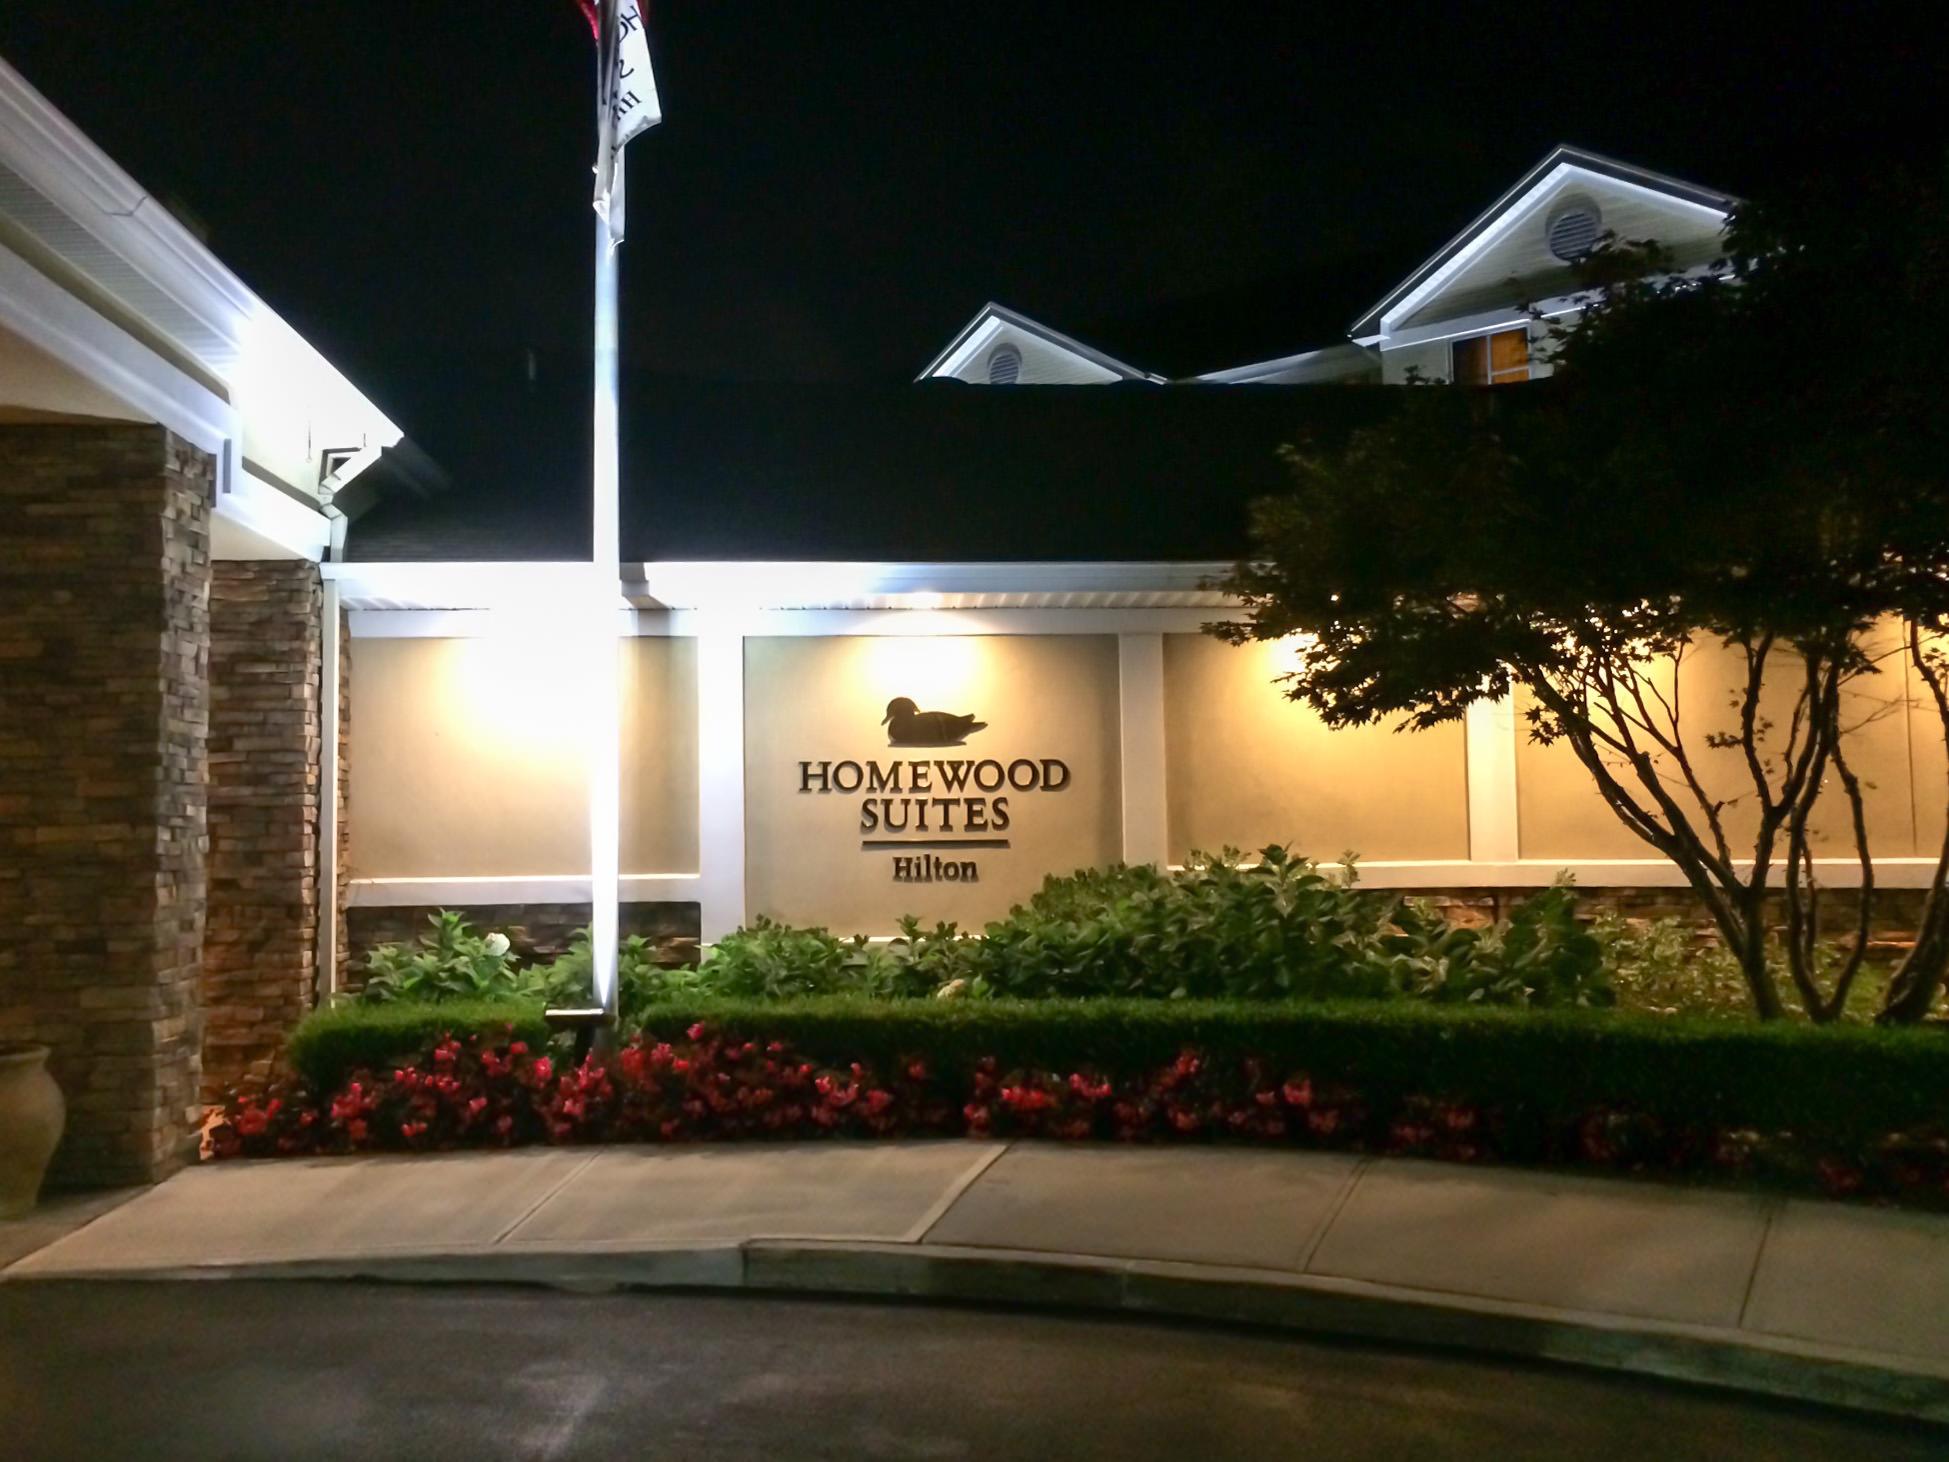 Hilton Homewood Suites ComPower LED 4-5.jpg